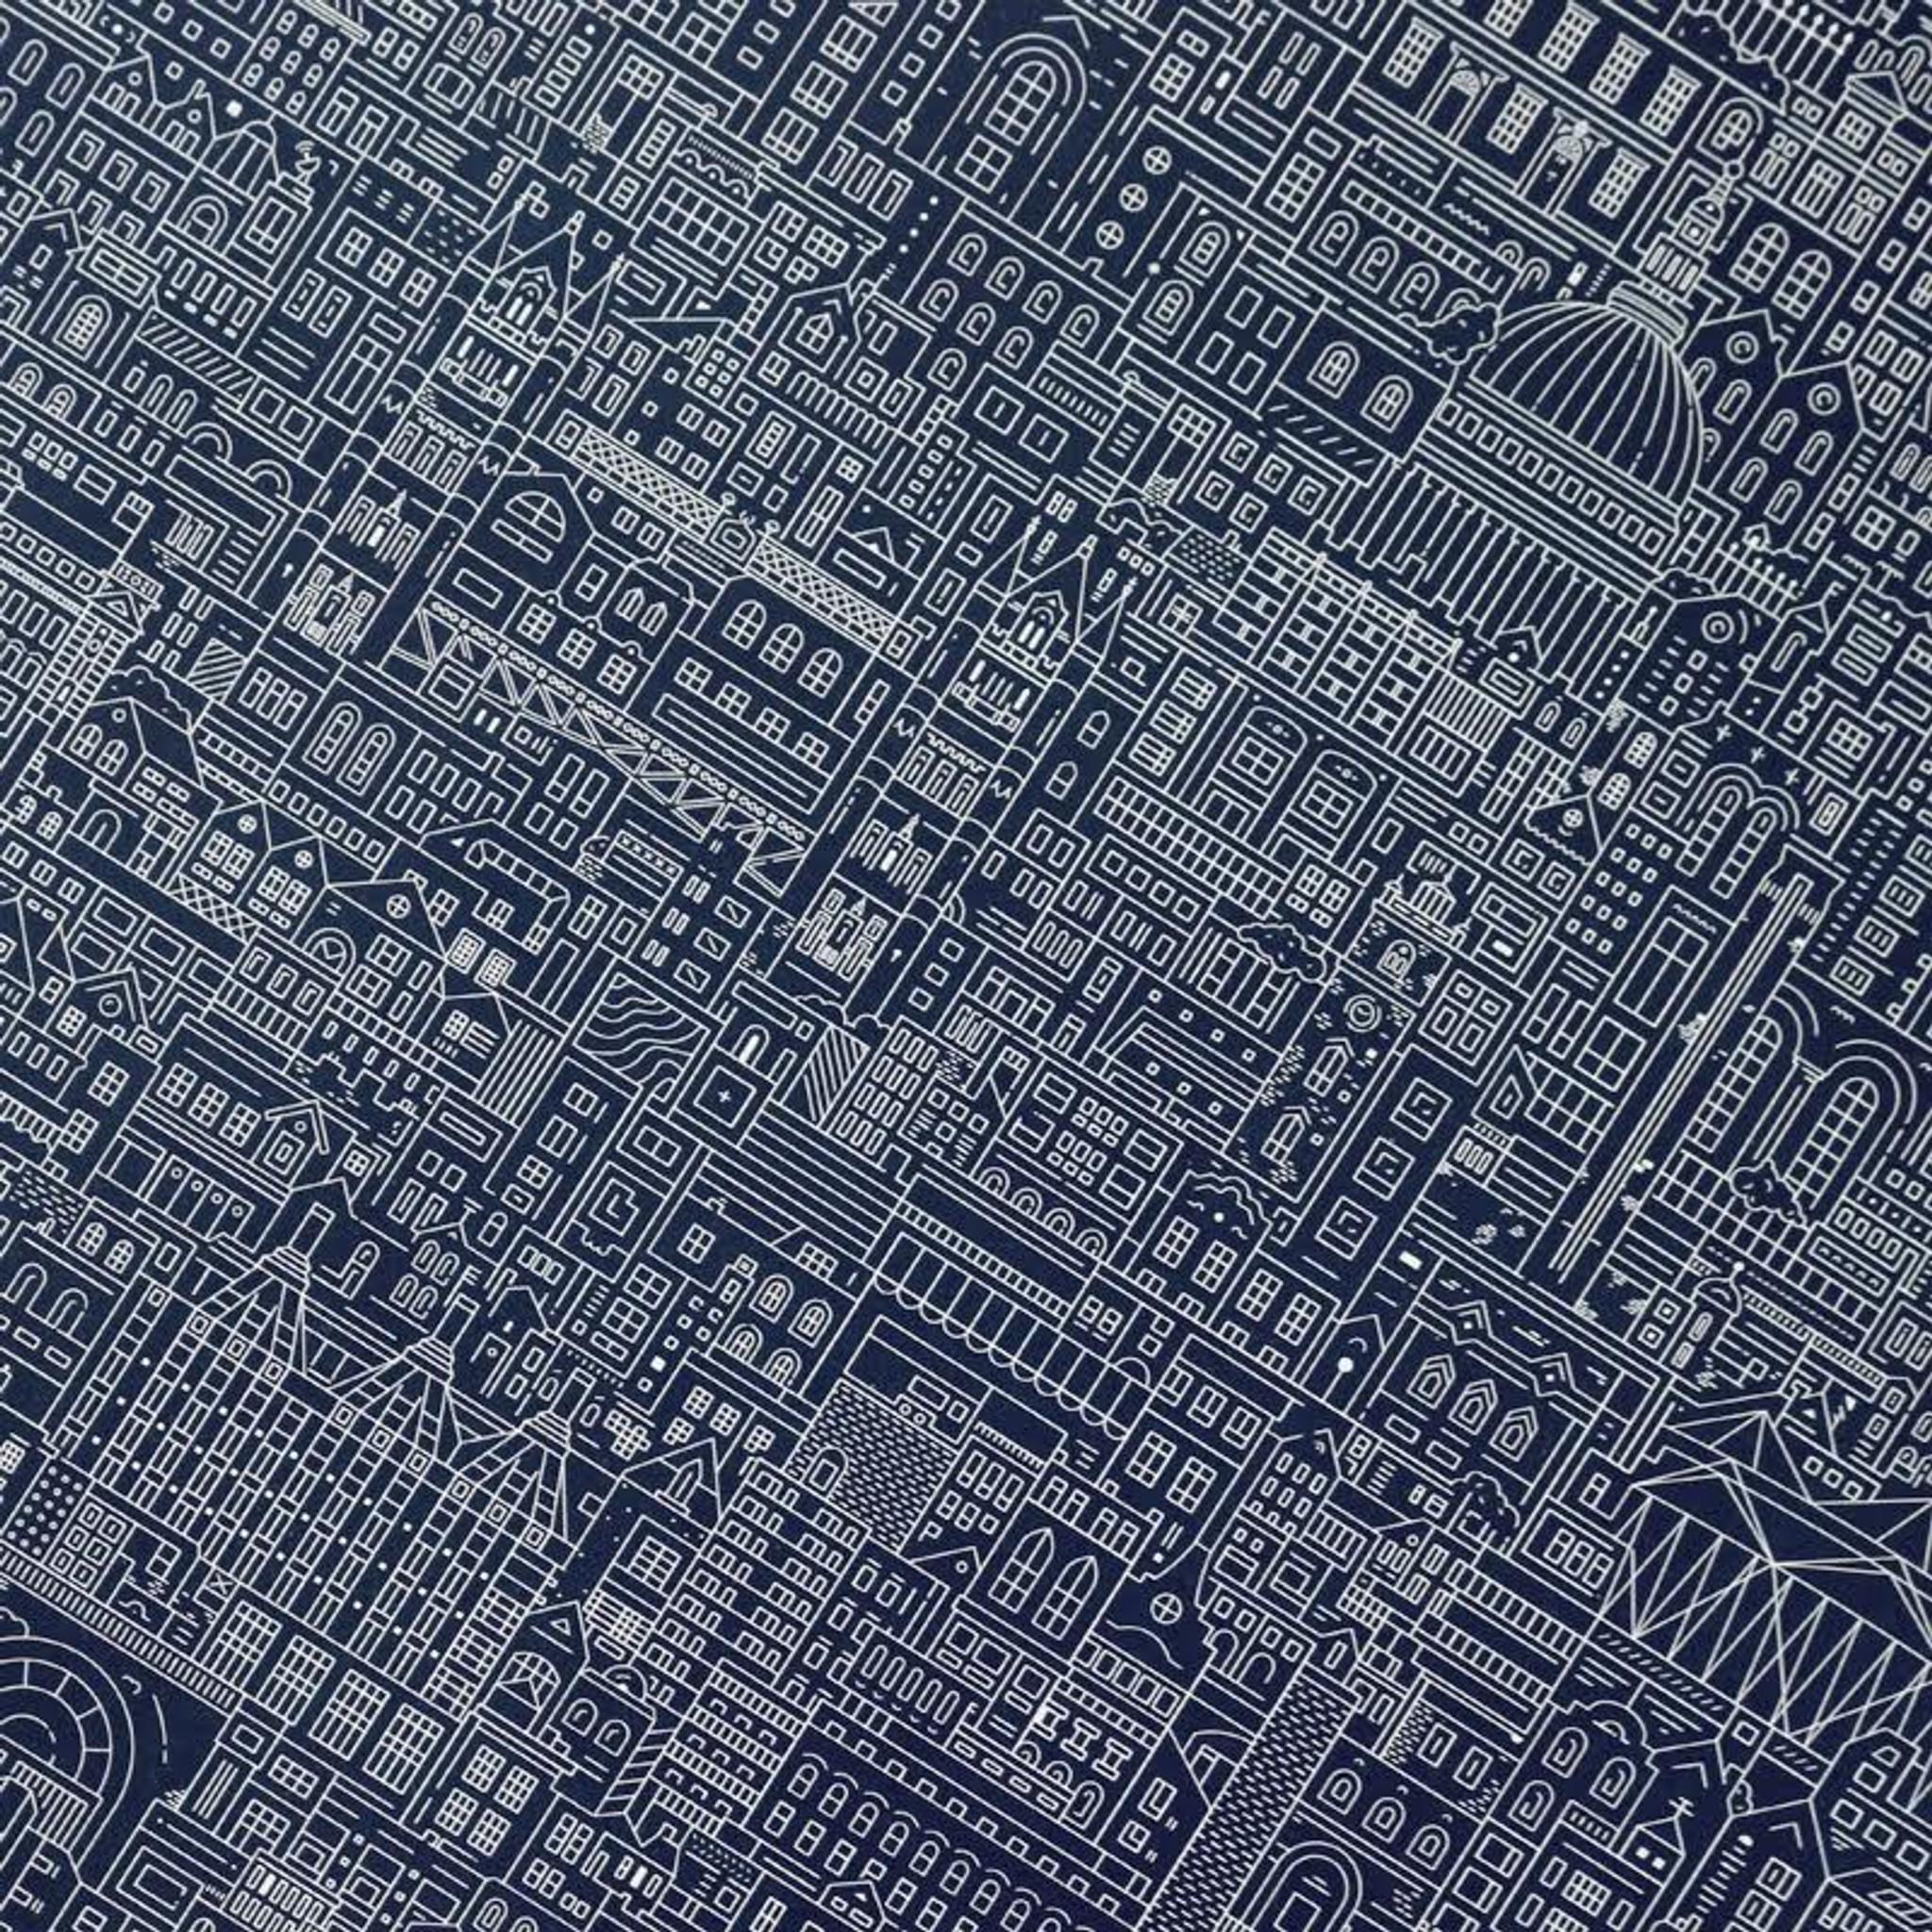 Beautiful London Cityscape Blueprint London Cityscape Blueprint